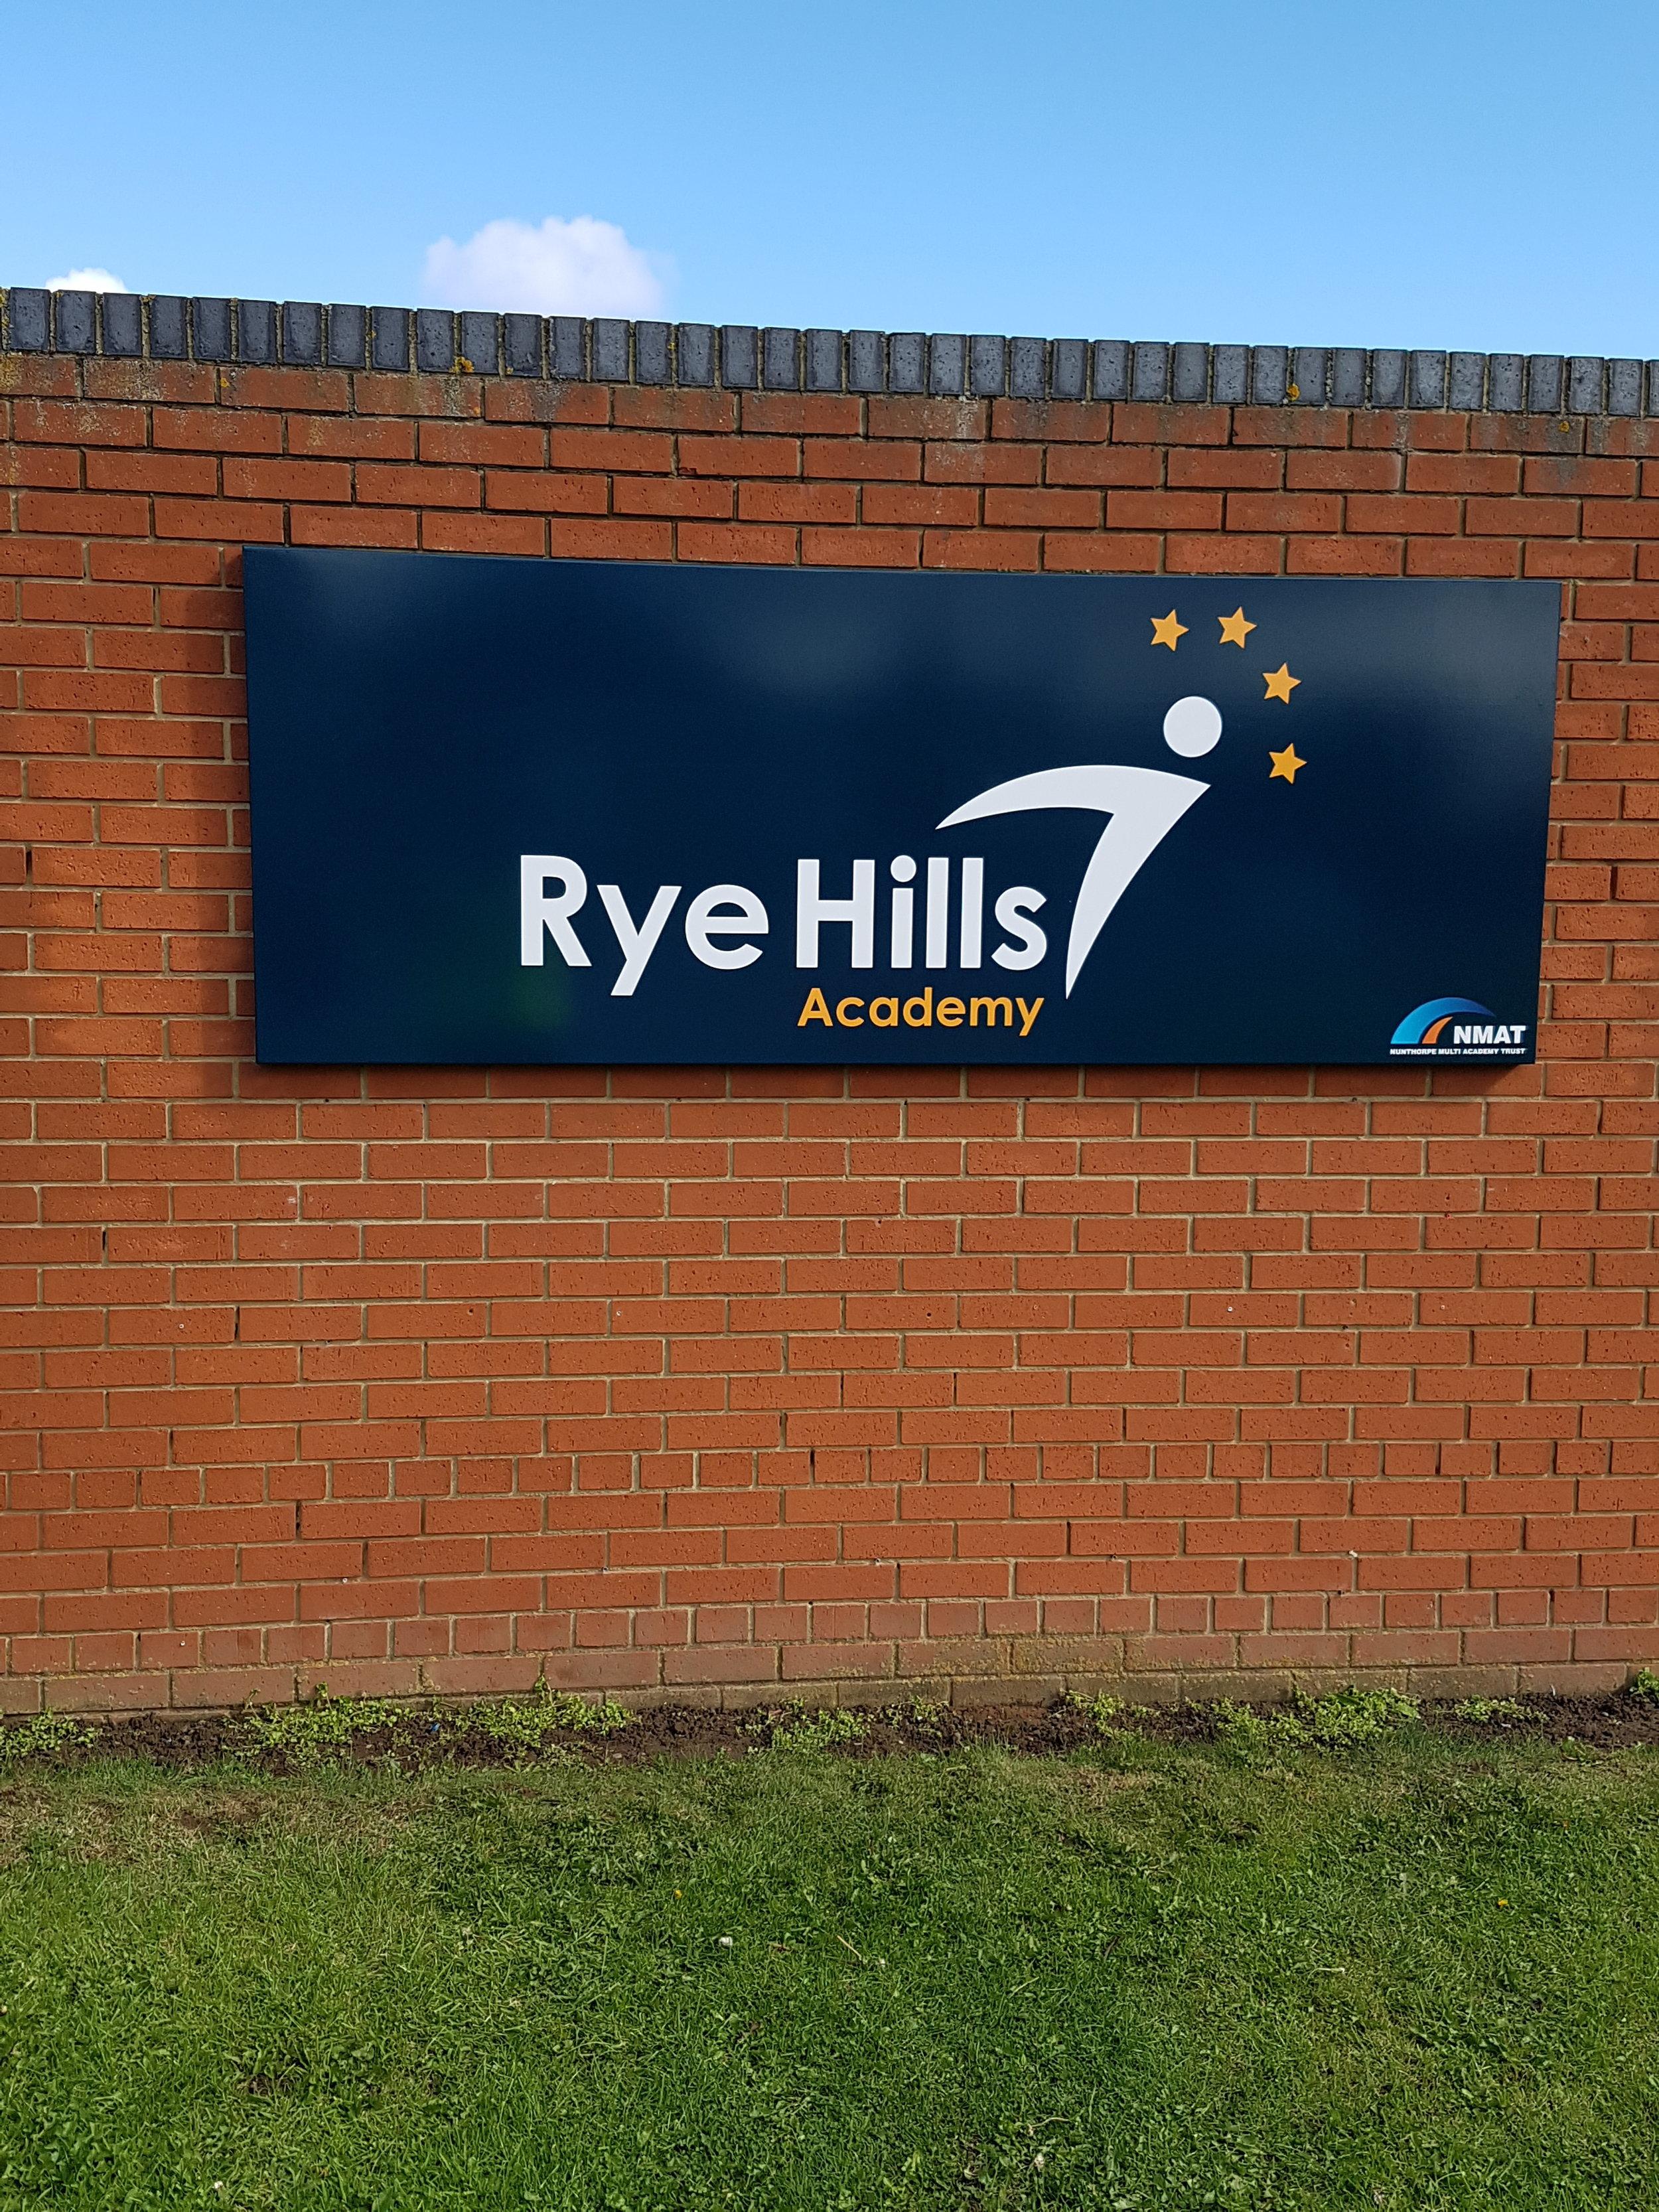 Rye Hills Academy